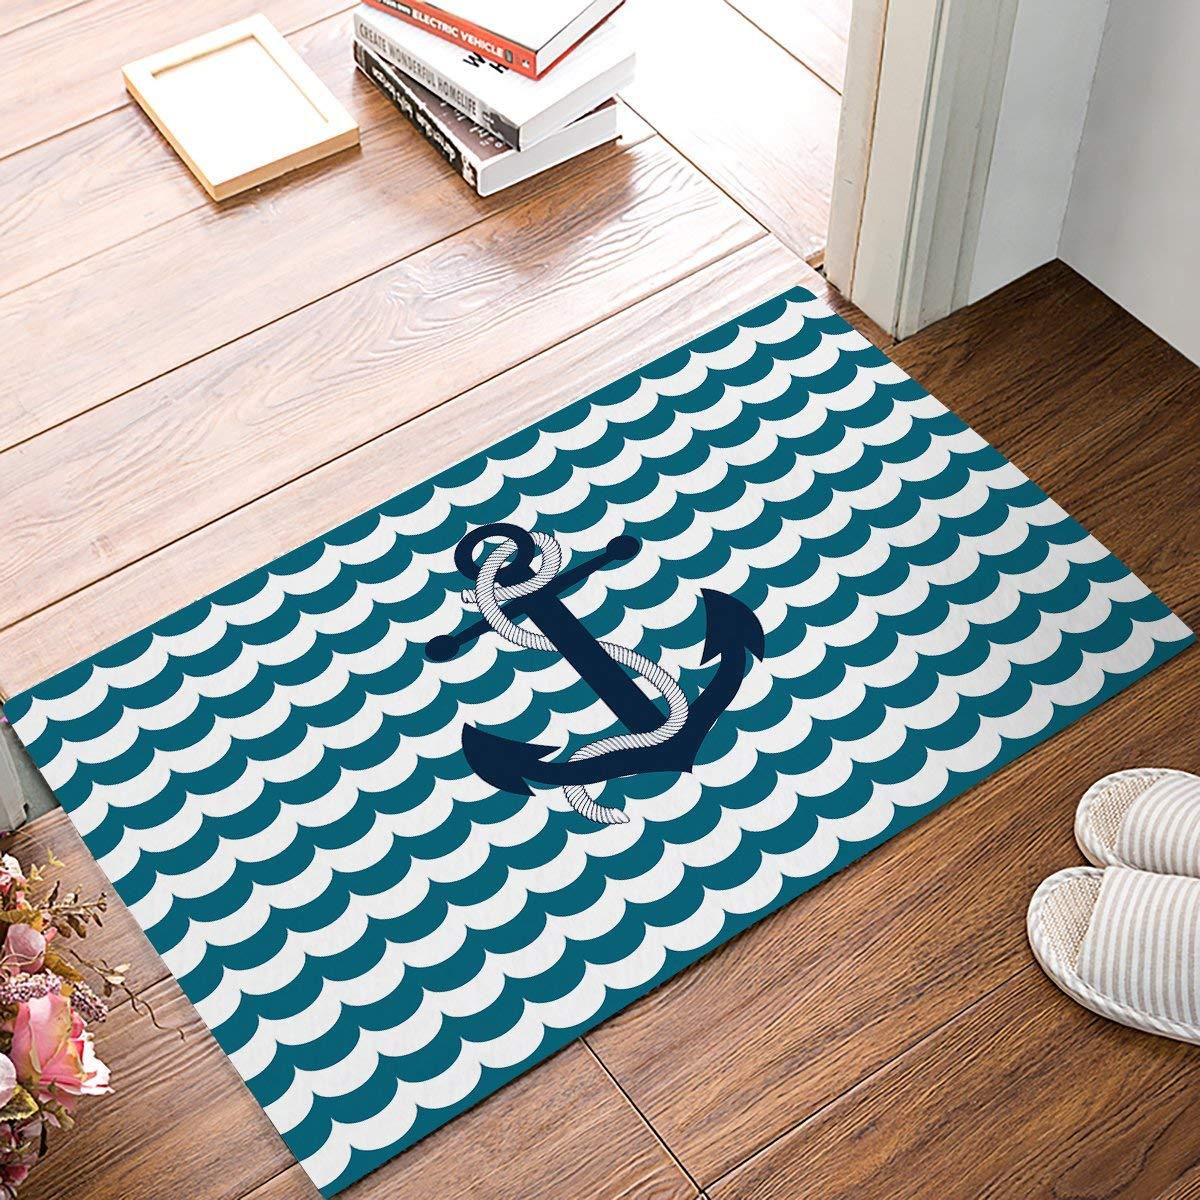 Corrugated Wave Anchor Door Mats Kitchen Floor Bath